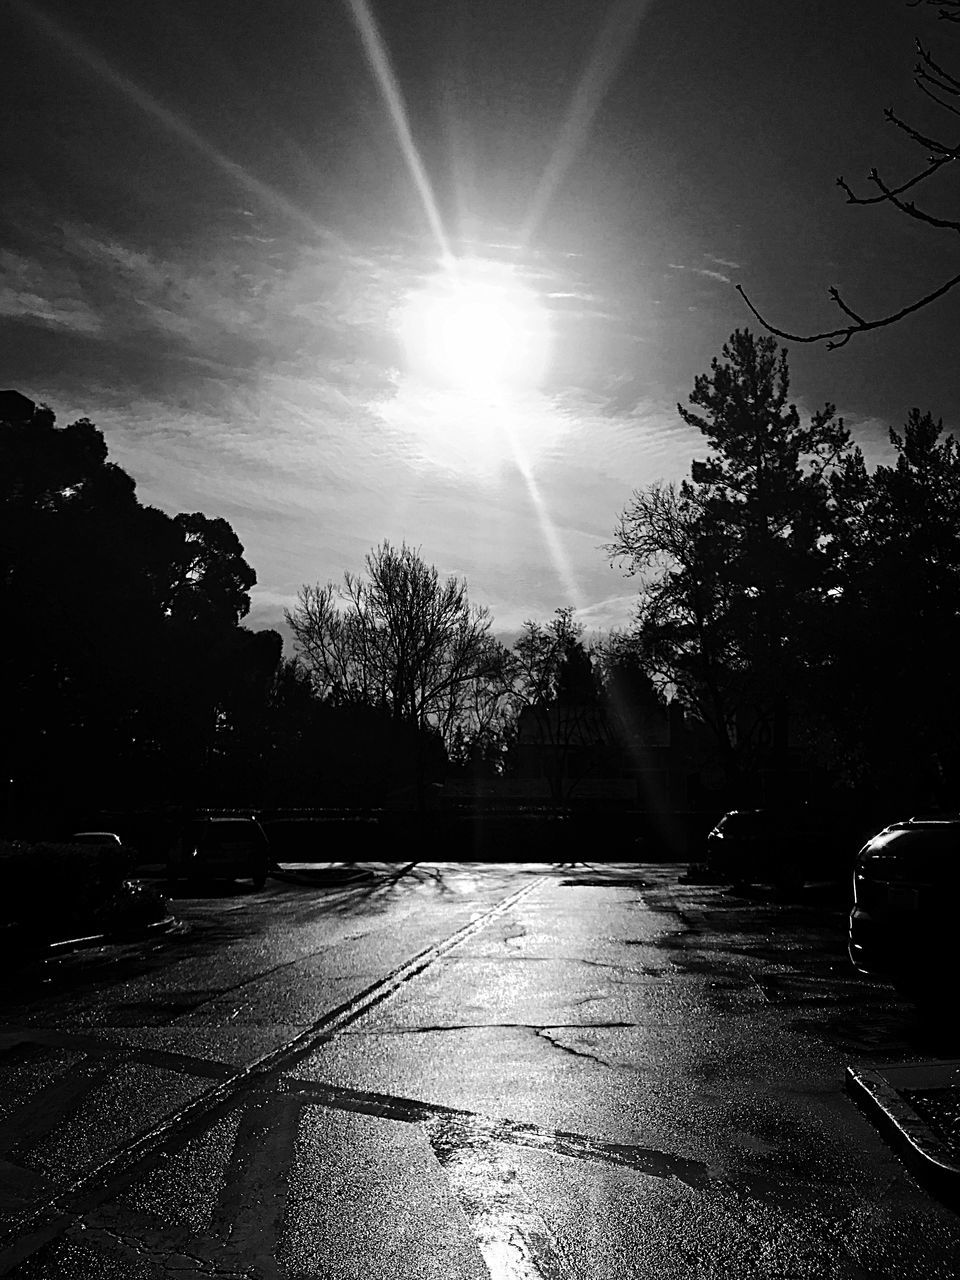 sun, tree, sunlight, car, transportation, outdoors, no people, silhouette, day, sky, nature